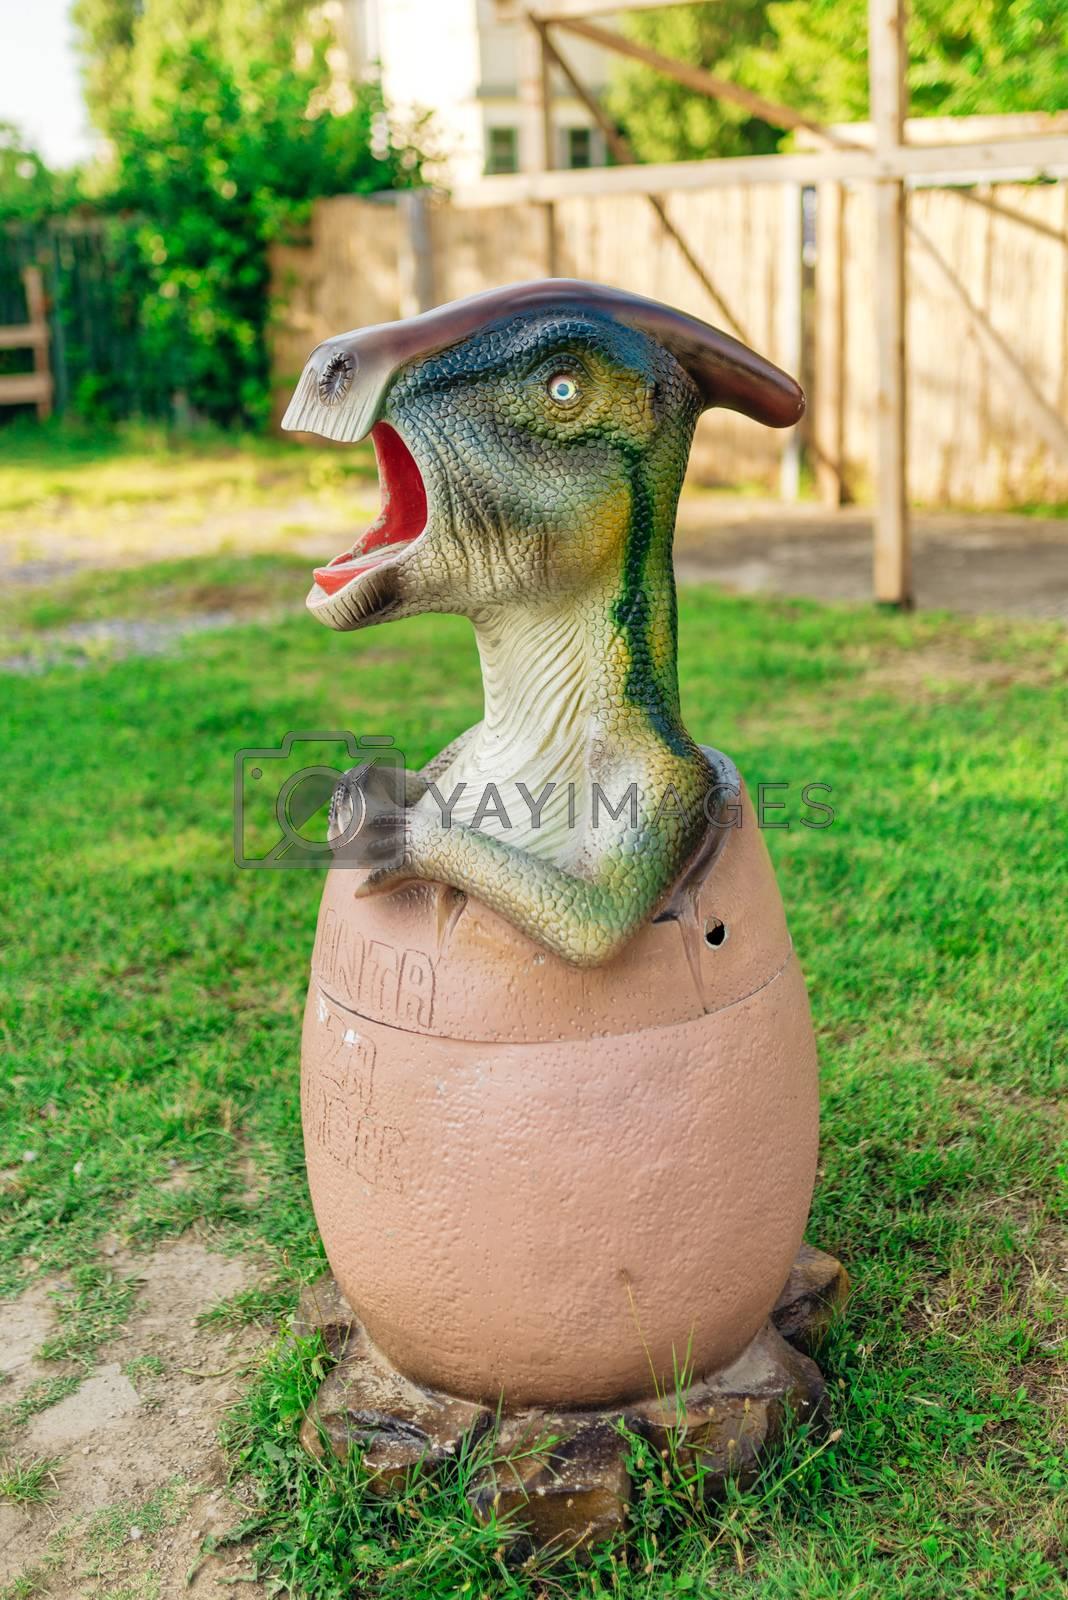 Detail from Novi Sad Dino Park by stevanovicigor